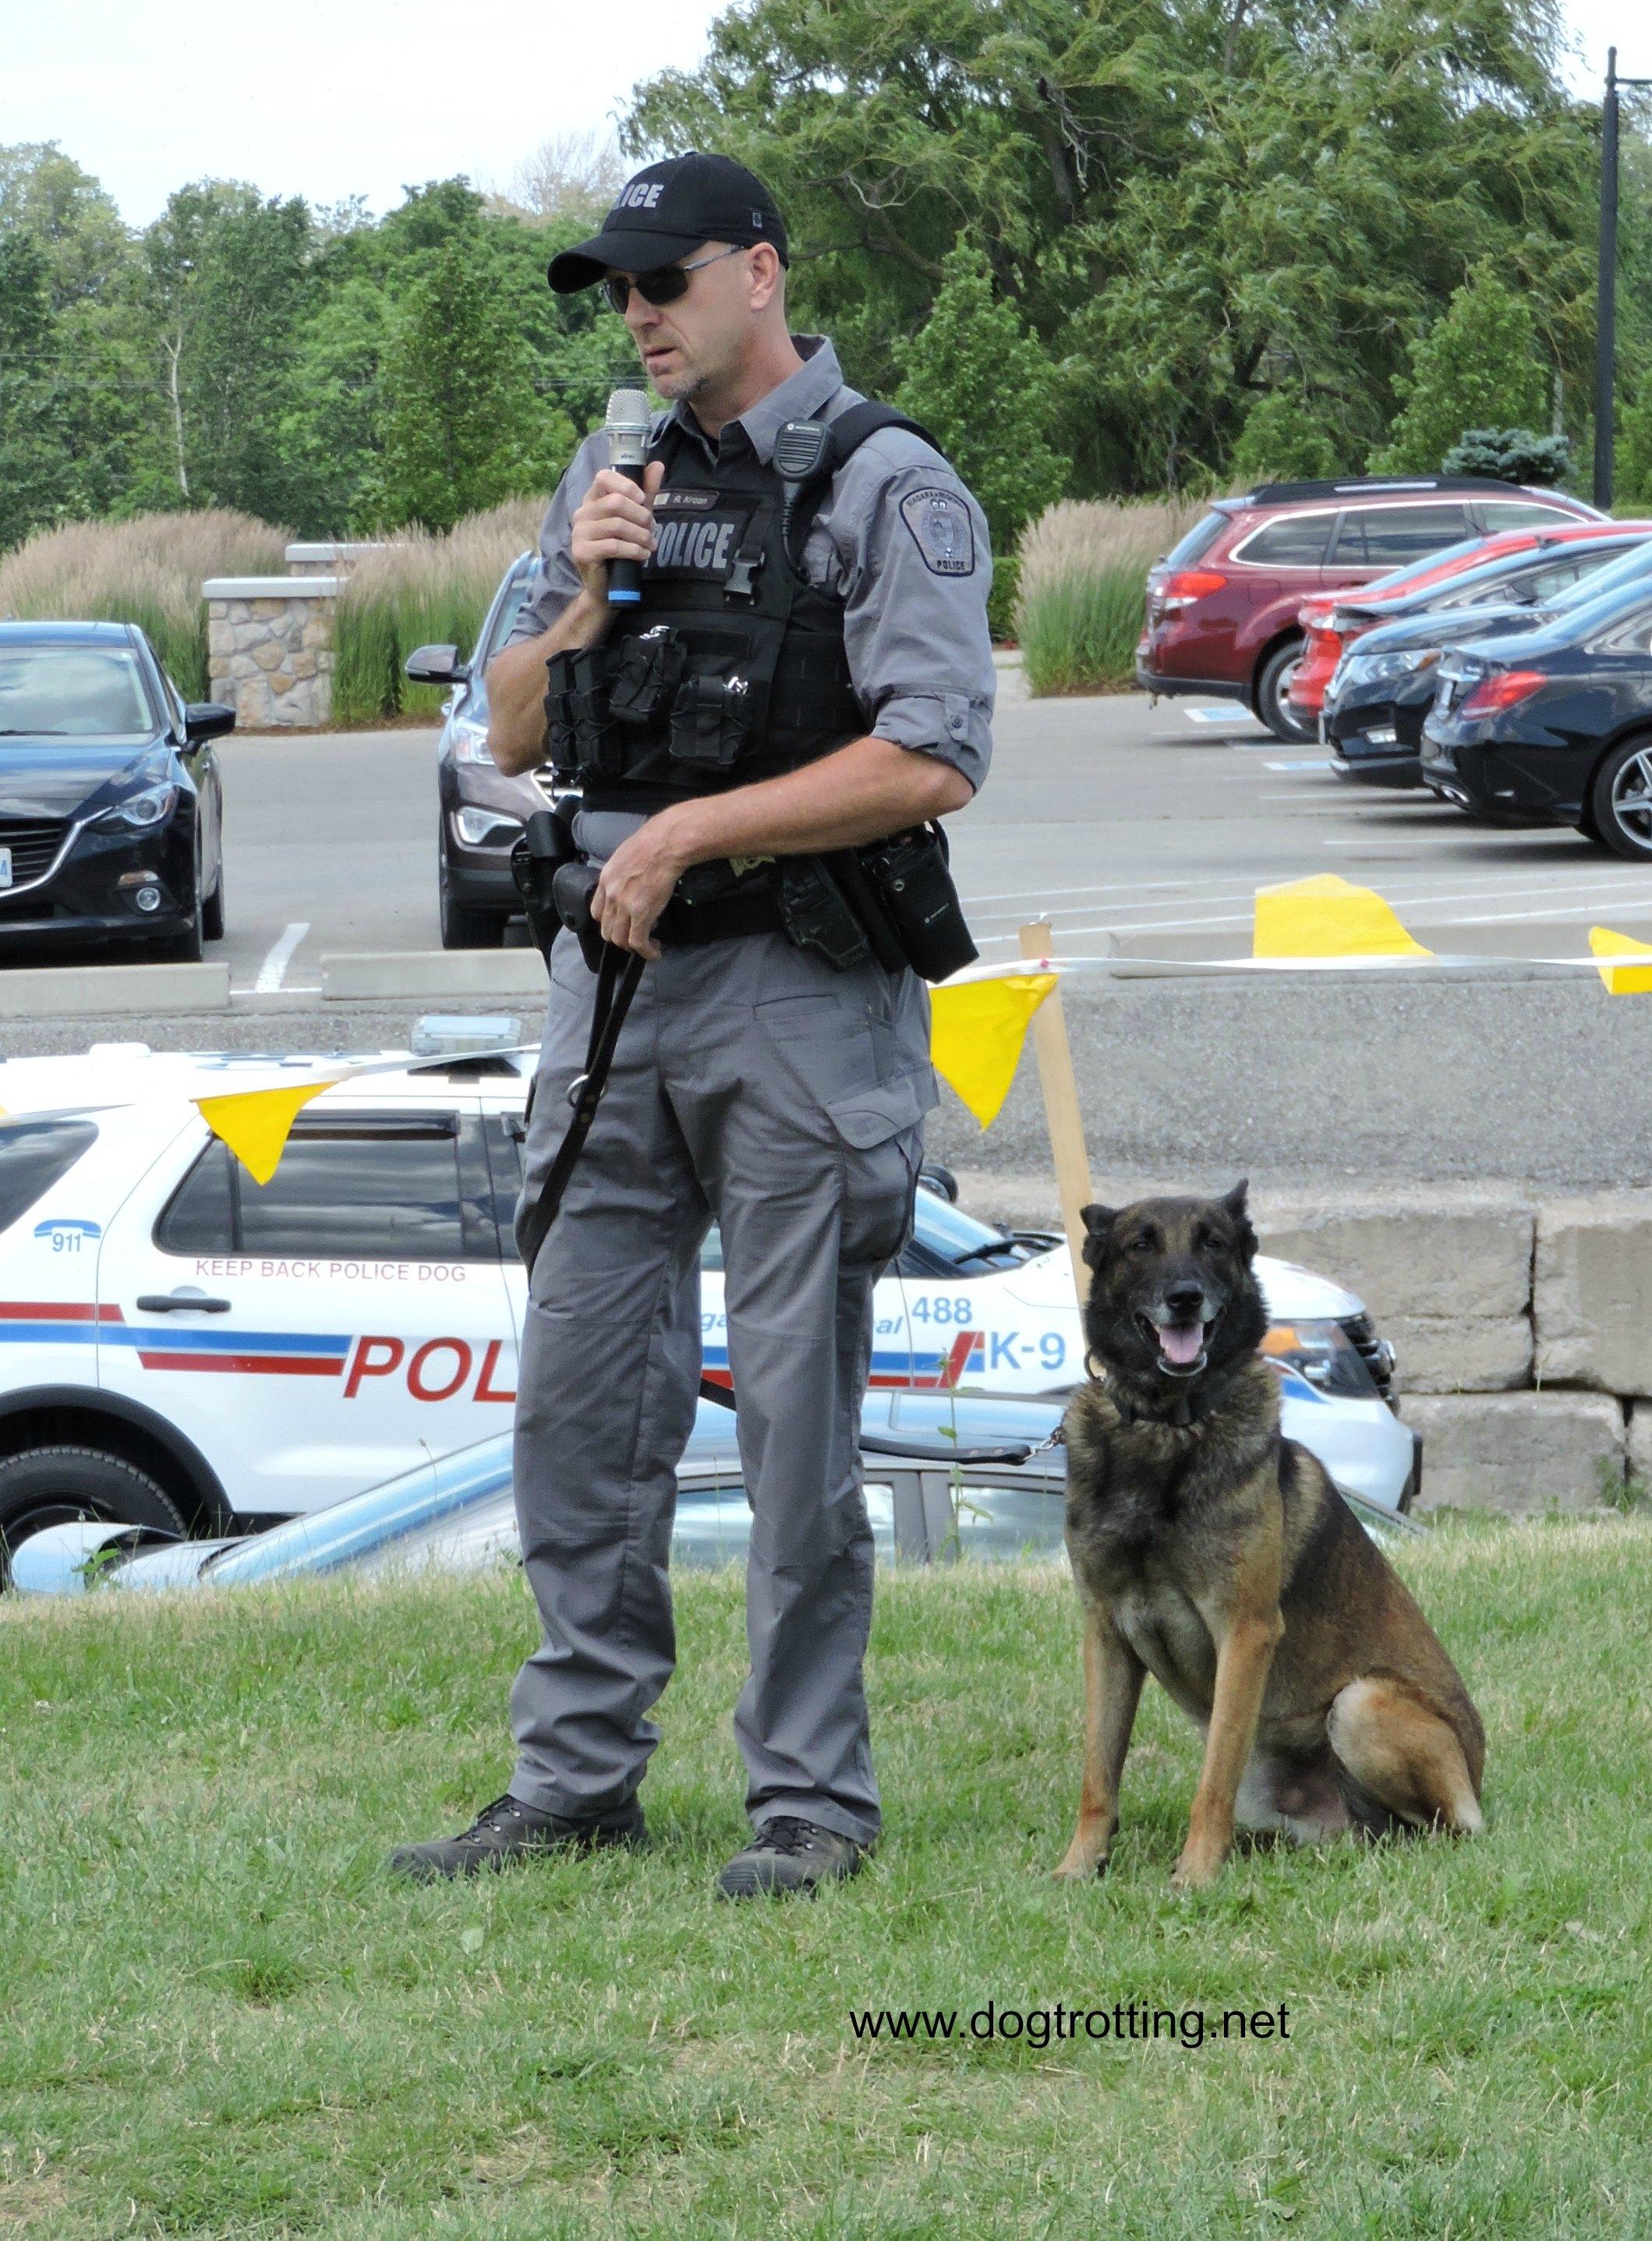 police dog demonstration at muddy paws wine and dog festival vineland ontario dogtrotting.net